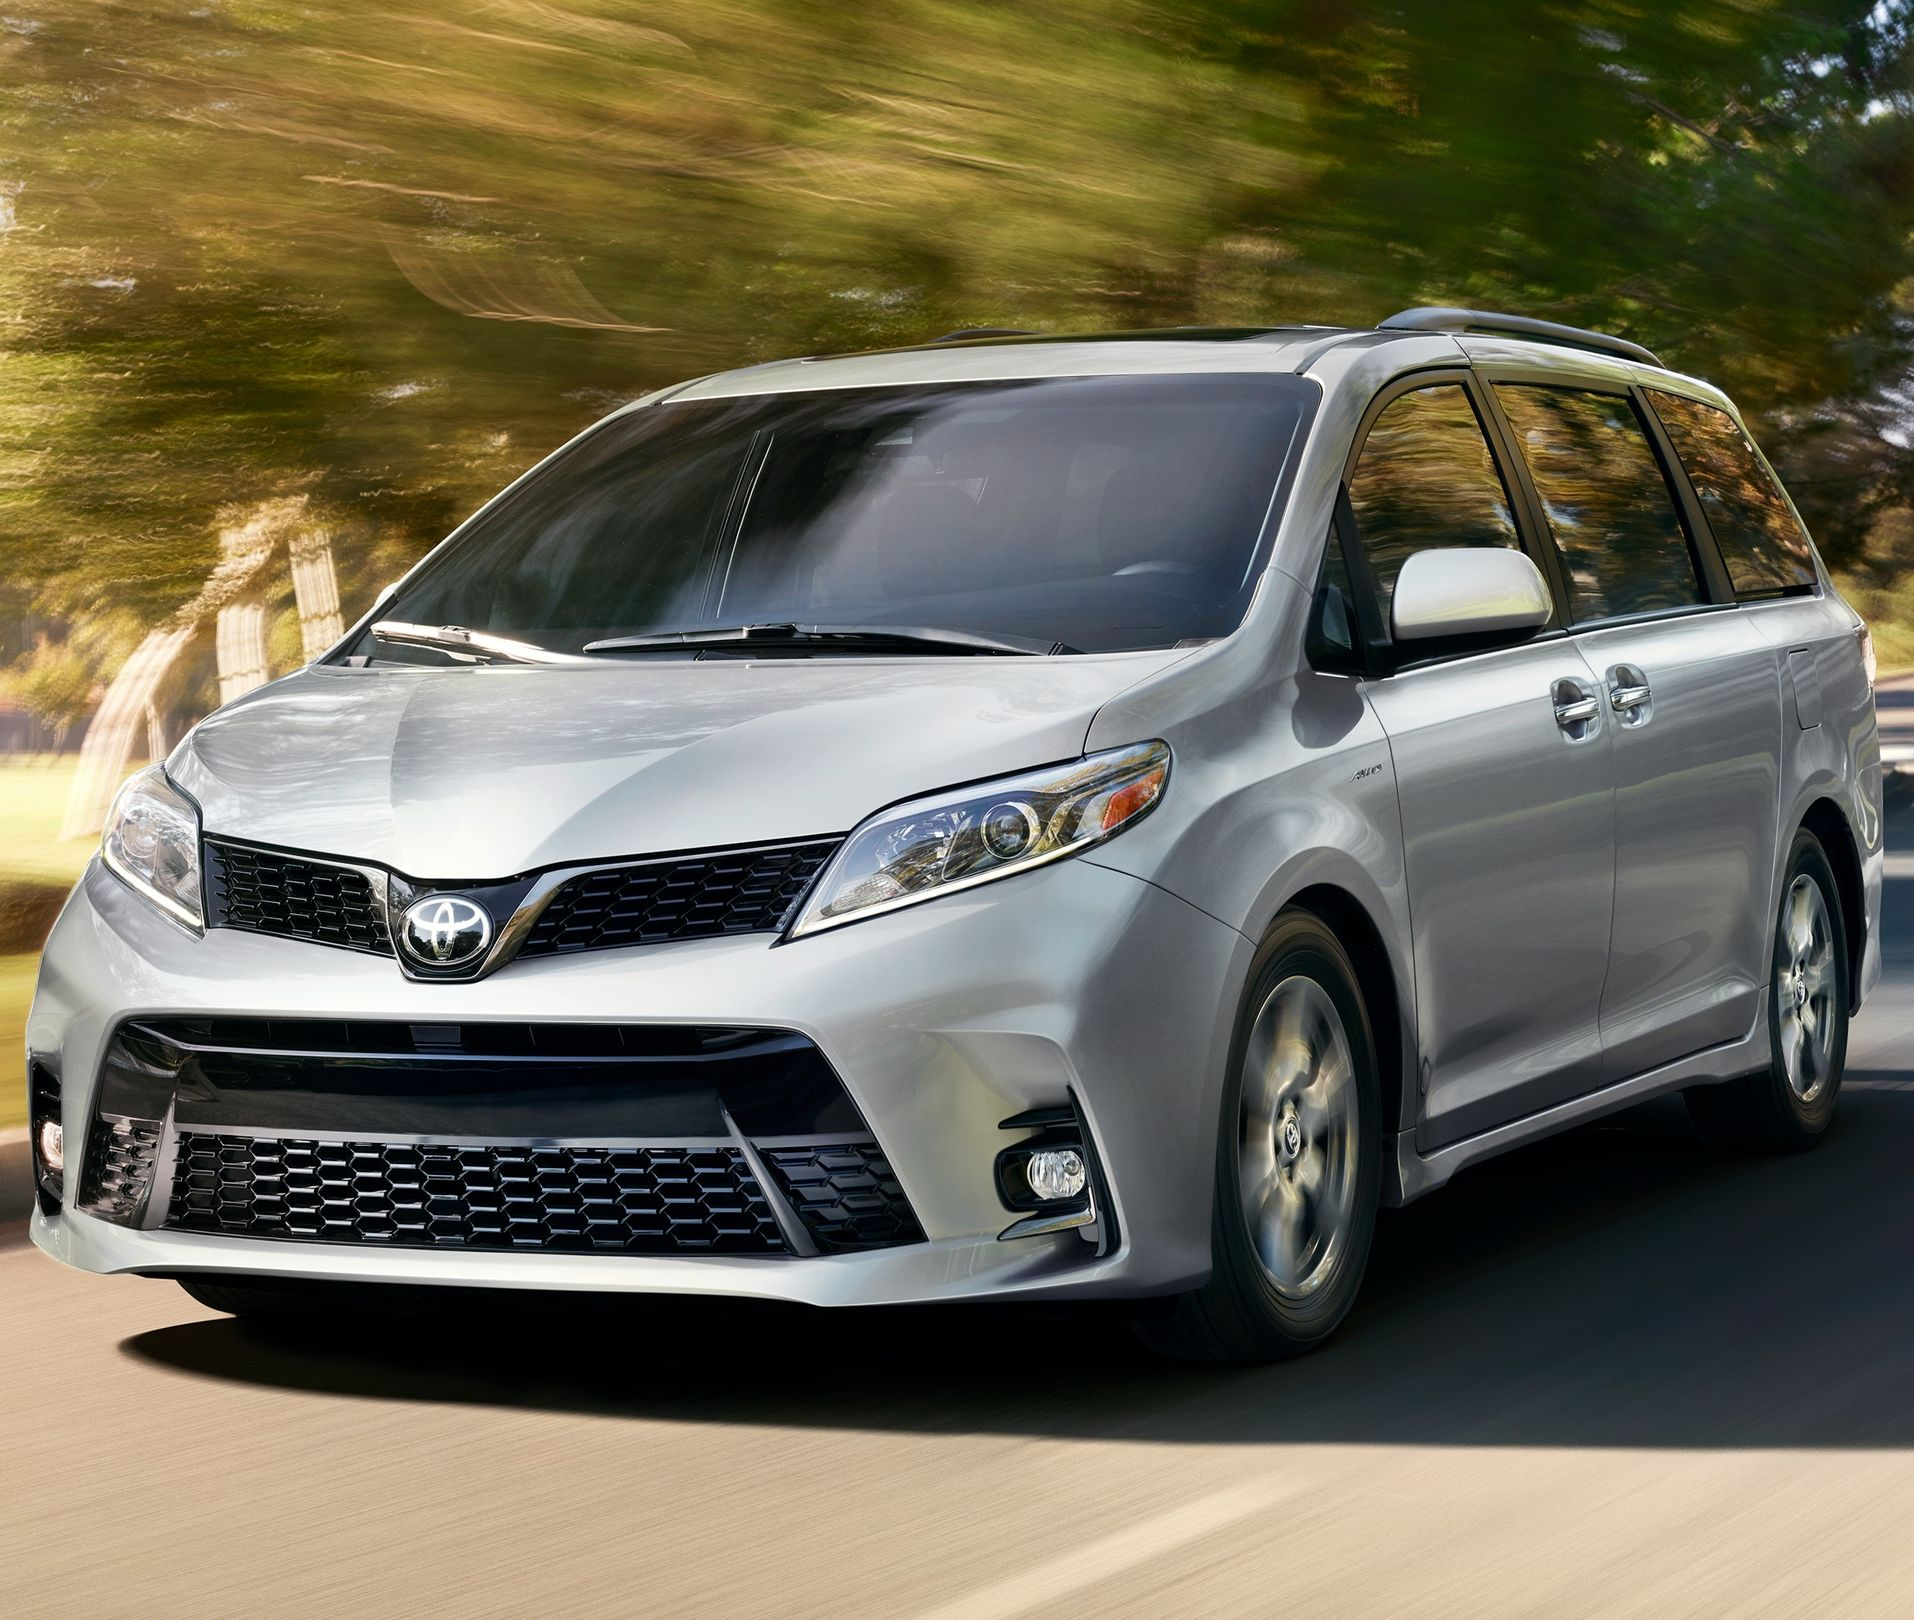 2019 Toyota Sienna Financing near Stamford, CT